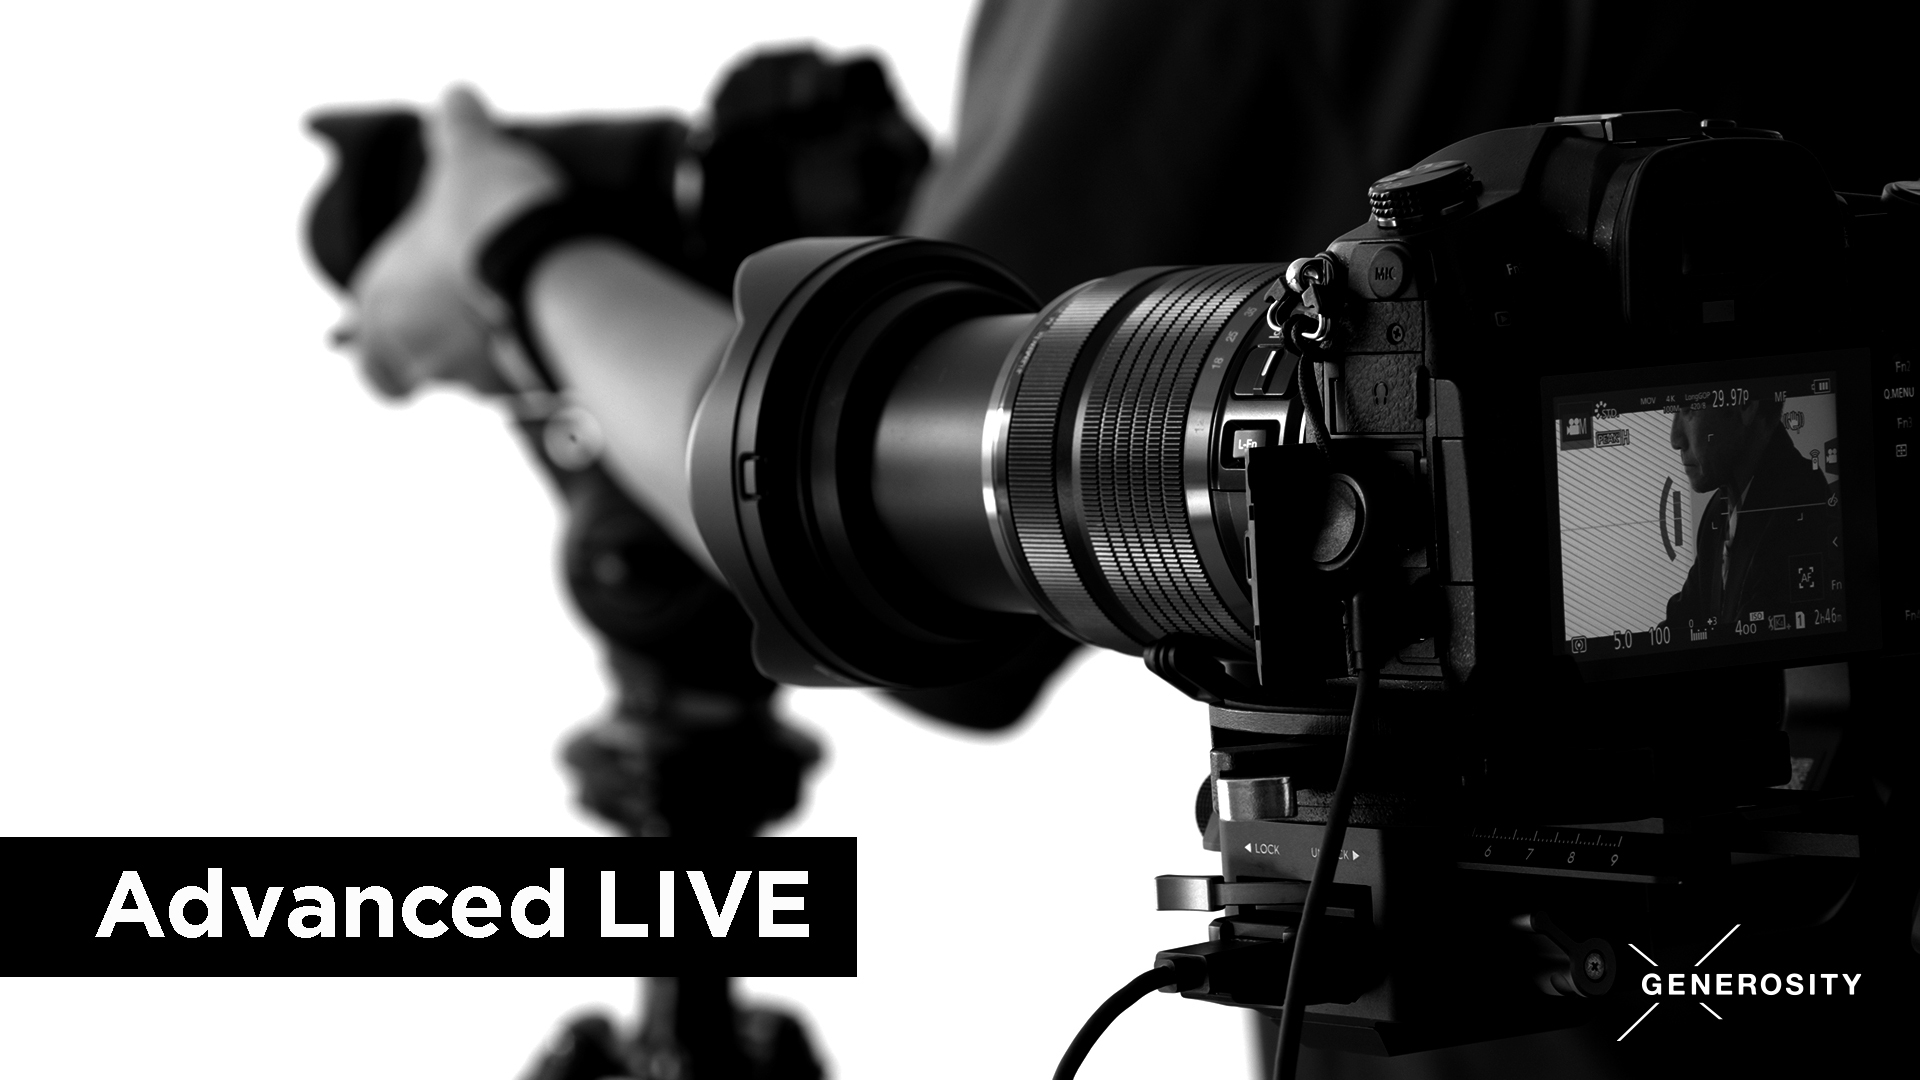 GENEROSITY、インスタライブを高画質で配信可能になる ライブ配信サービス「Advanced LIVE」を提供開始